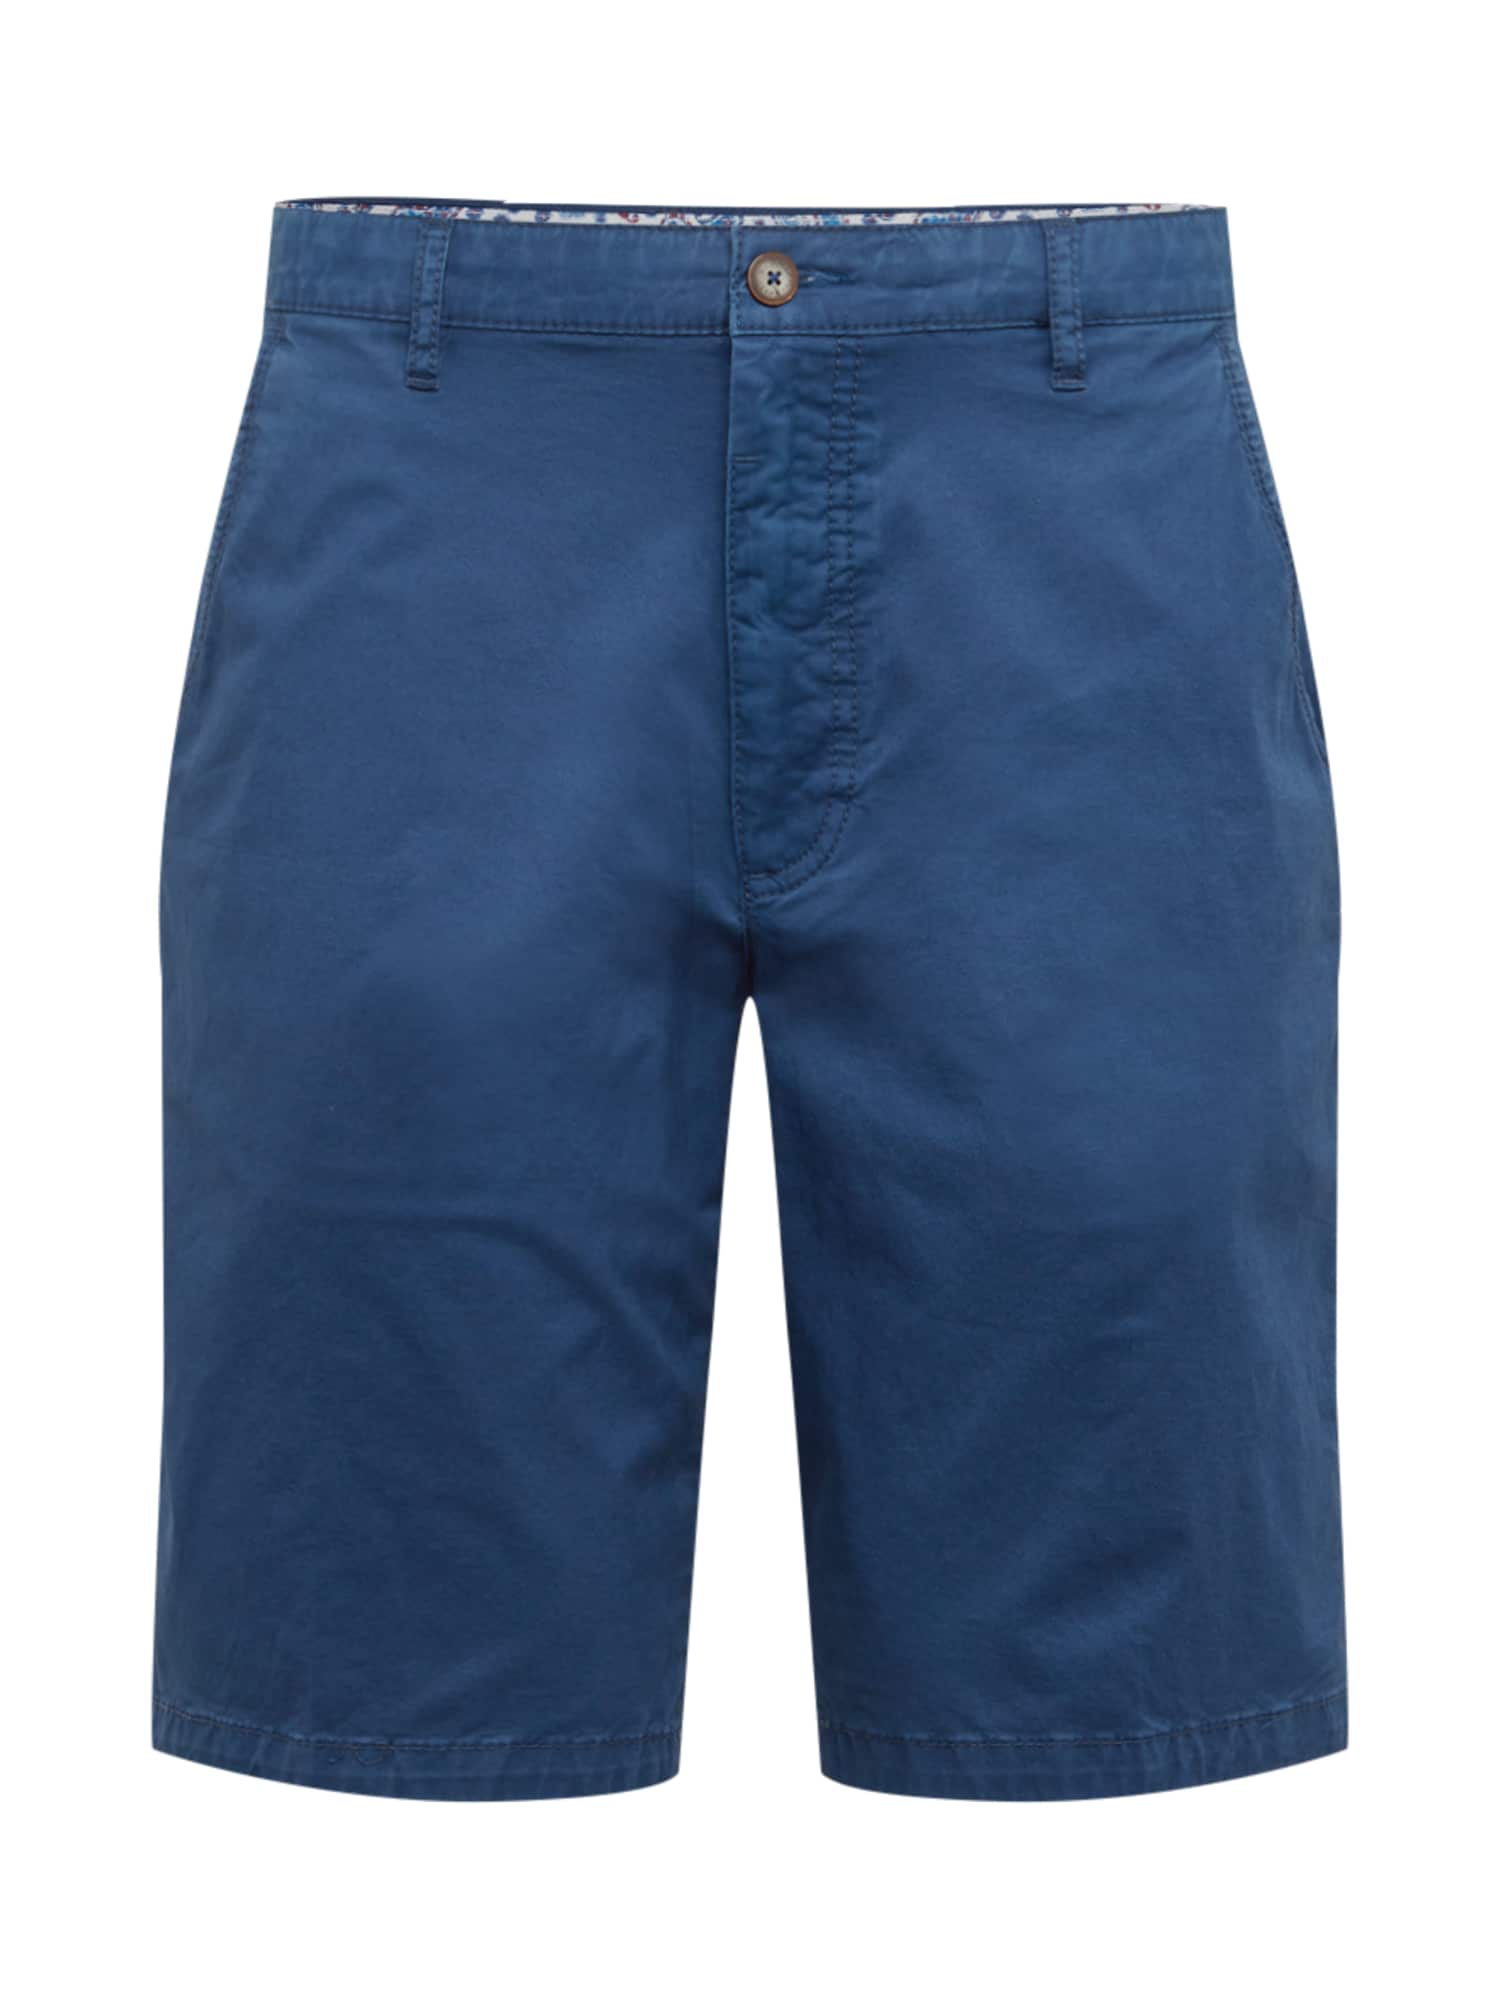 Chino kalhoty 4869 modrá Bugatti